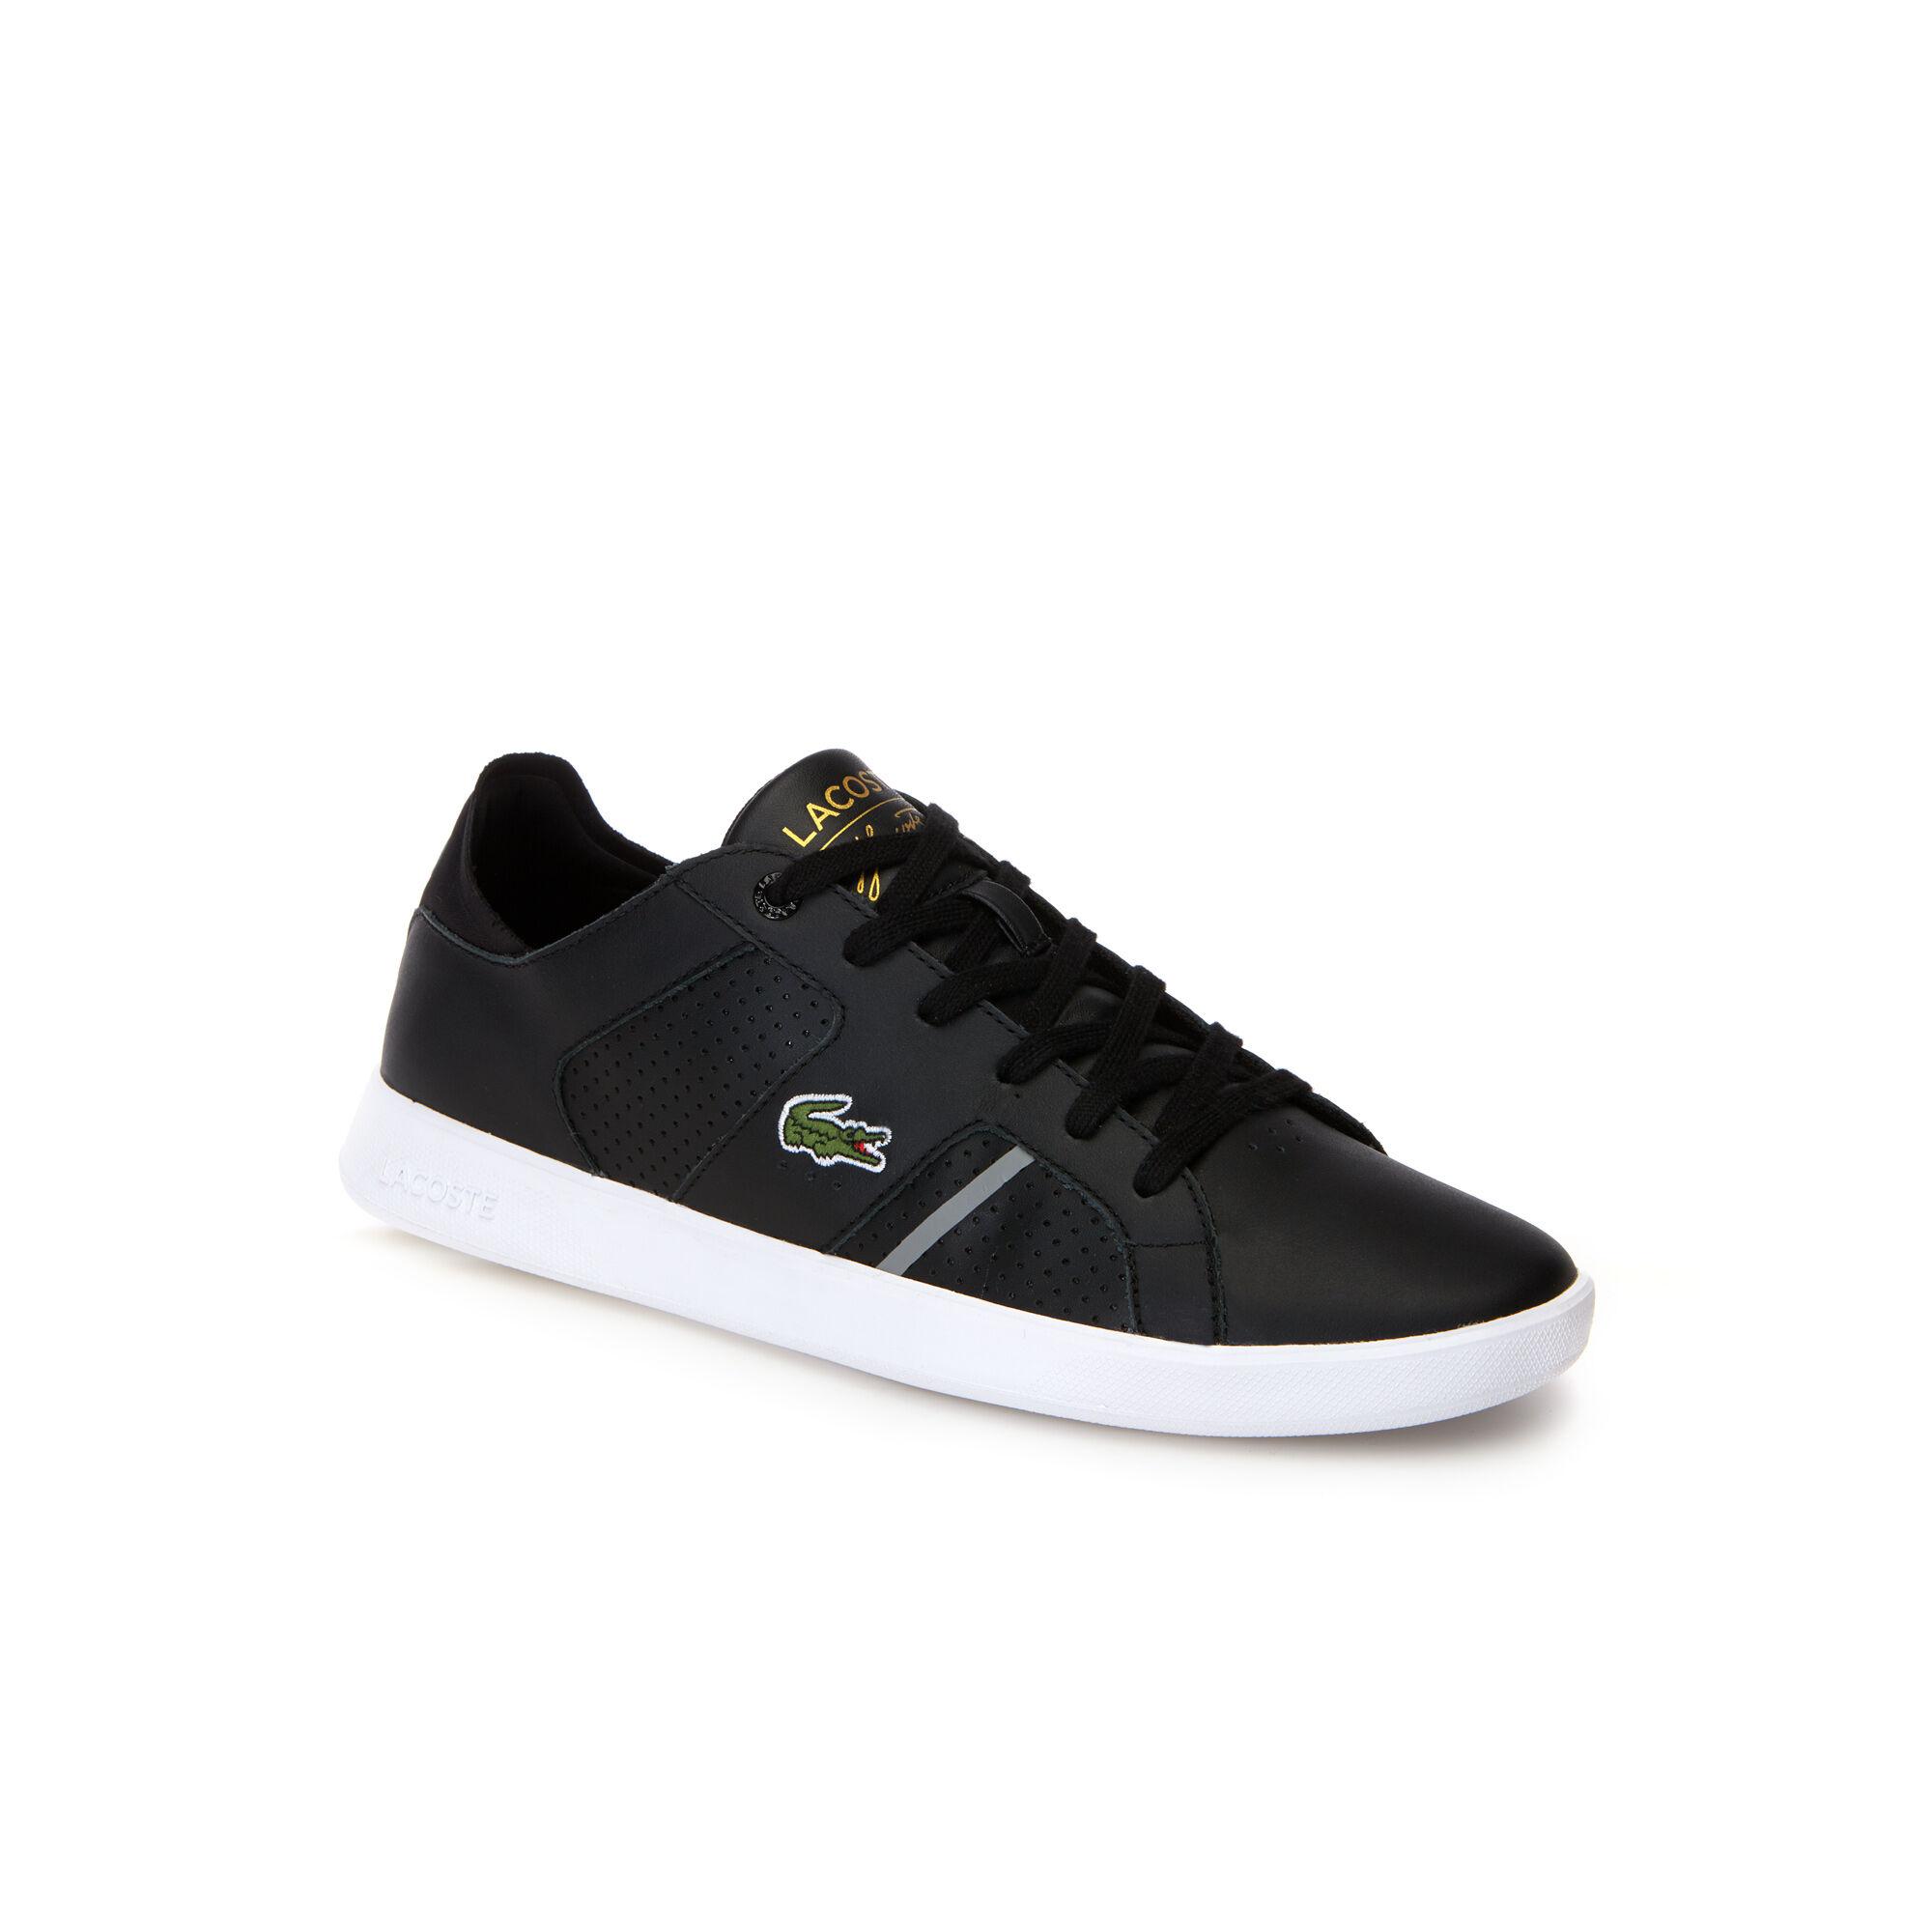 Lacoste Lerond 117 3 Sneaker Men Khaki Textile Leather the most fashion designs